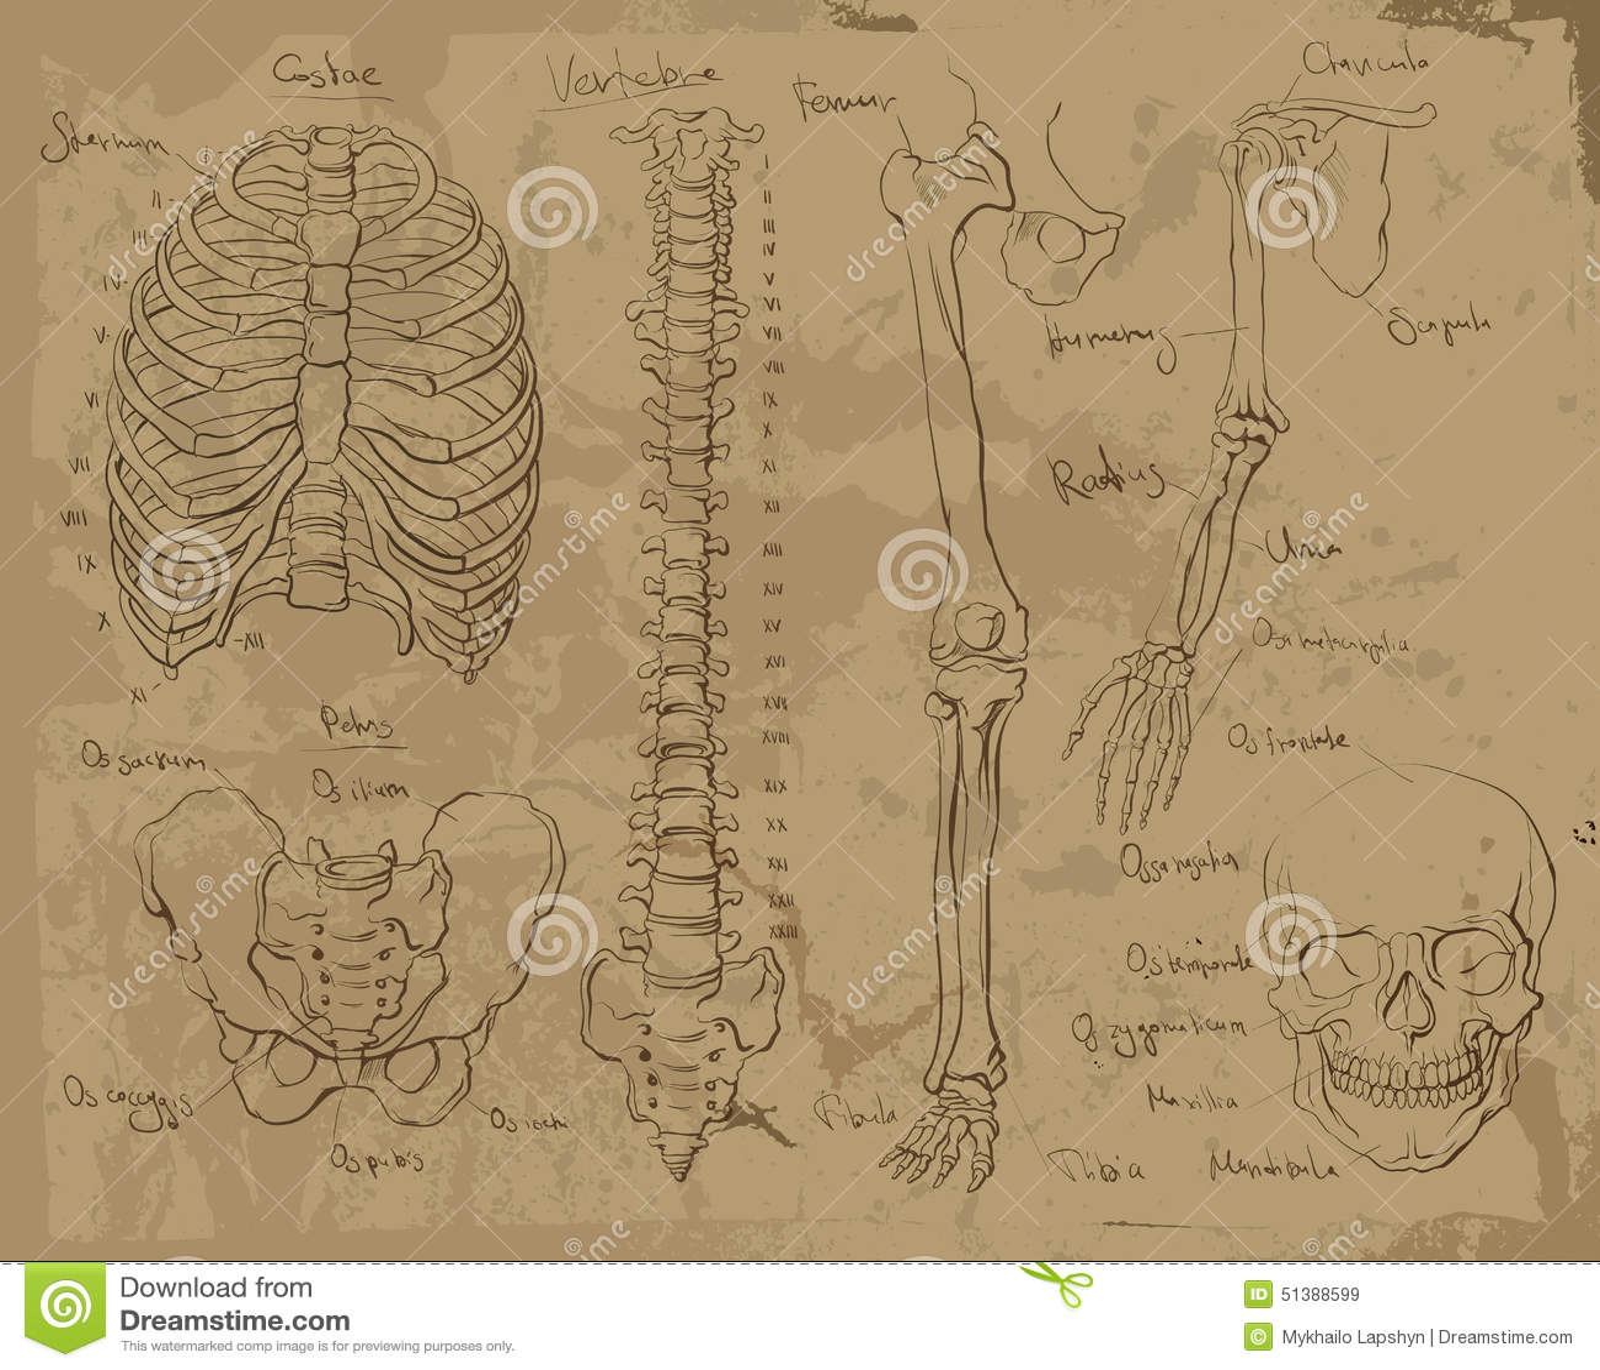 Drawings of human anatomy stock illustration. Illustration of finger ...